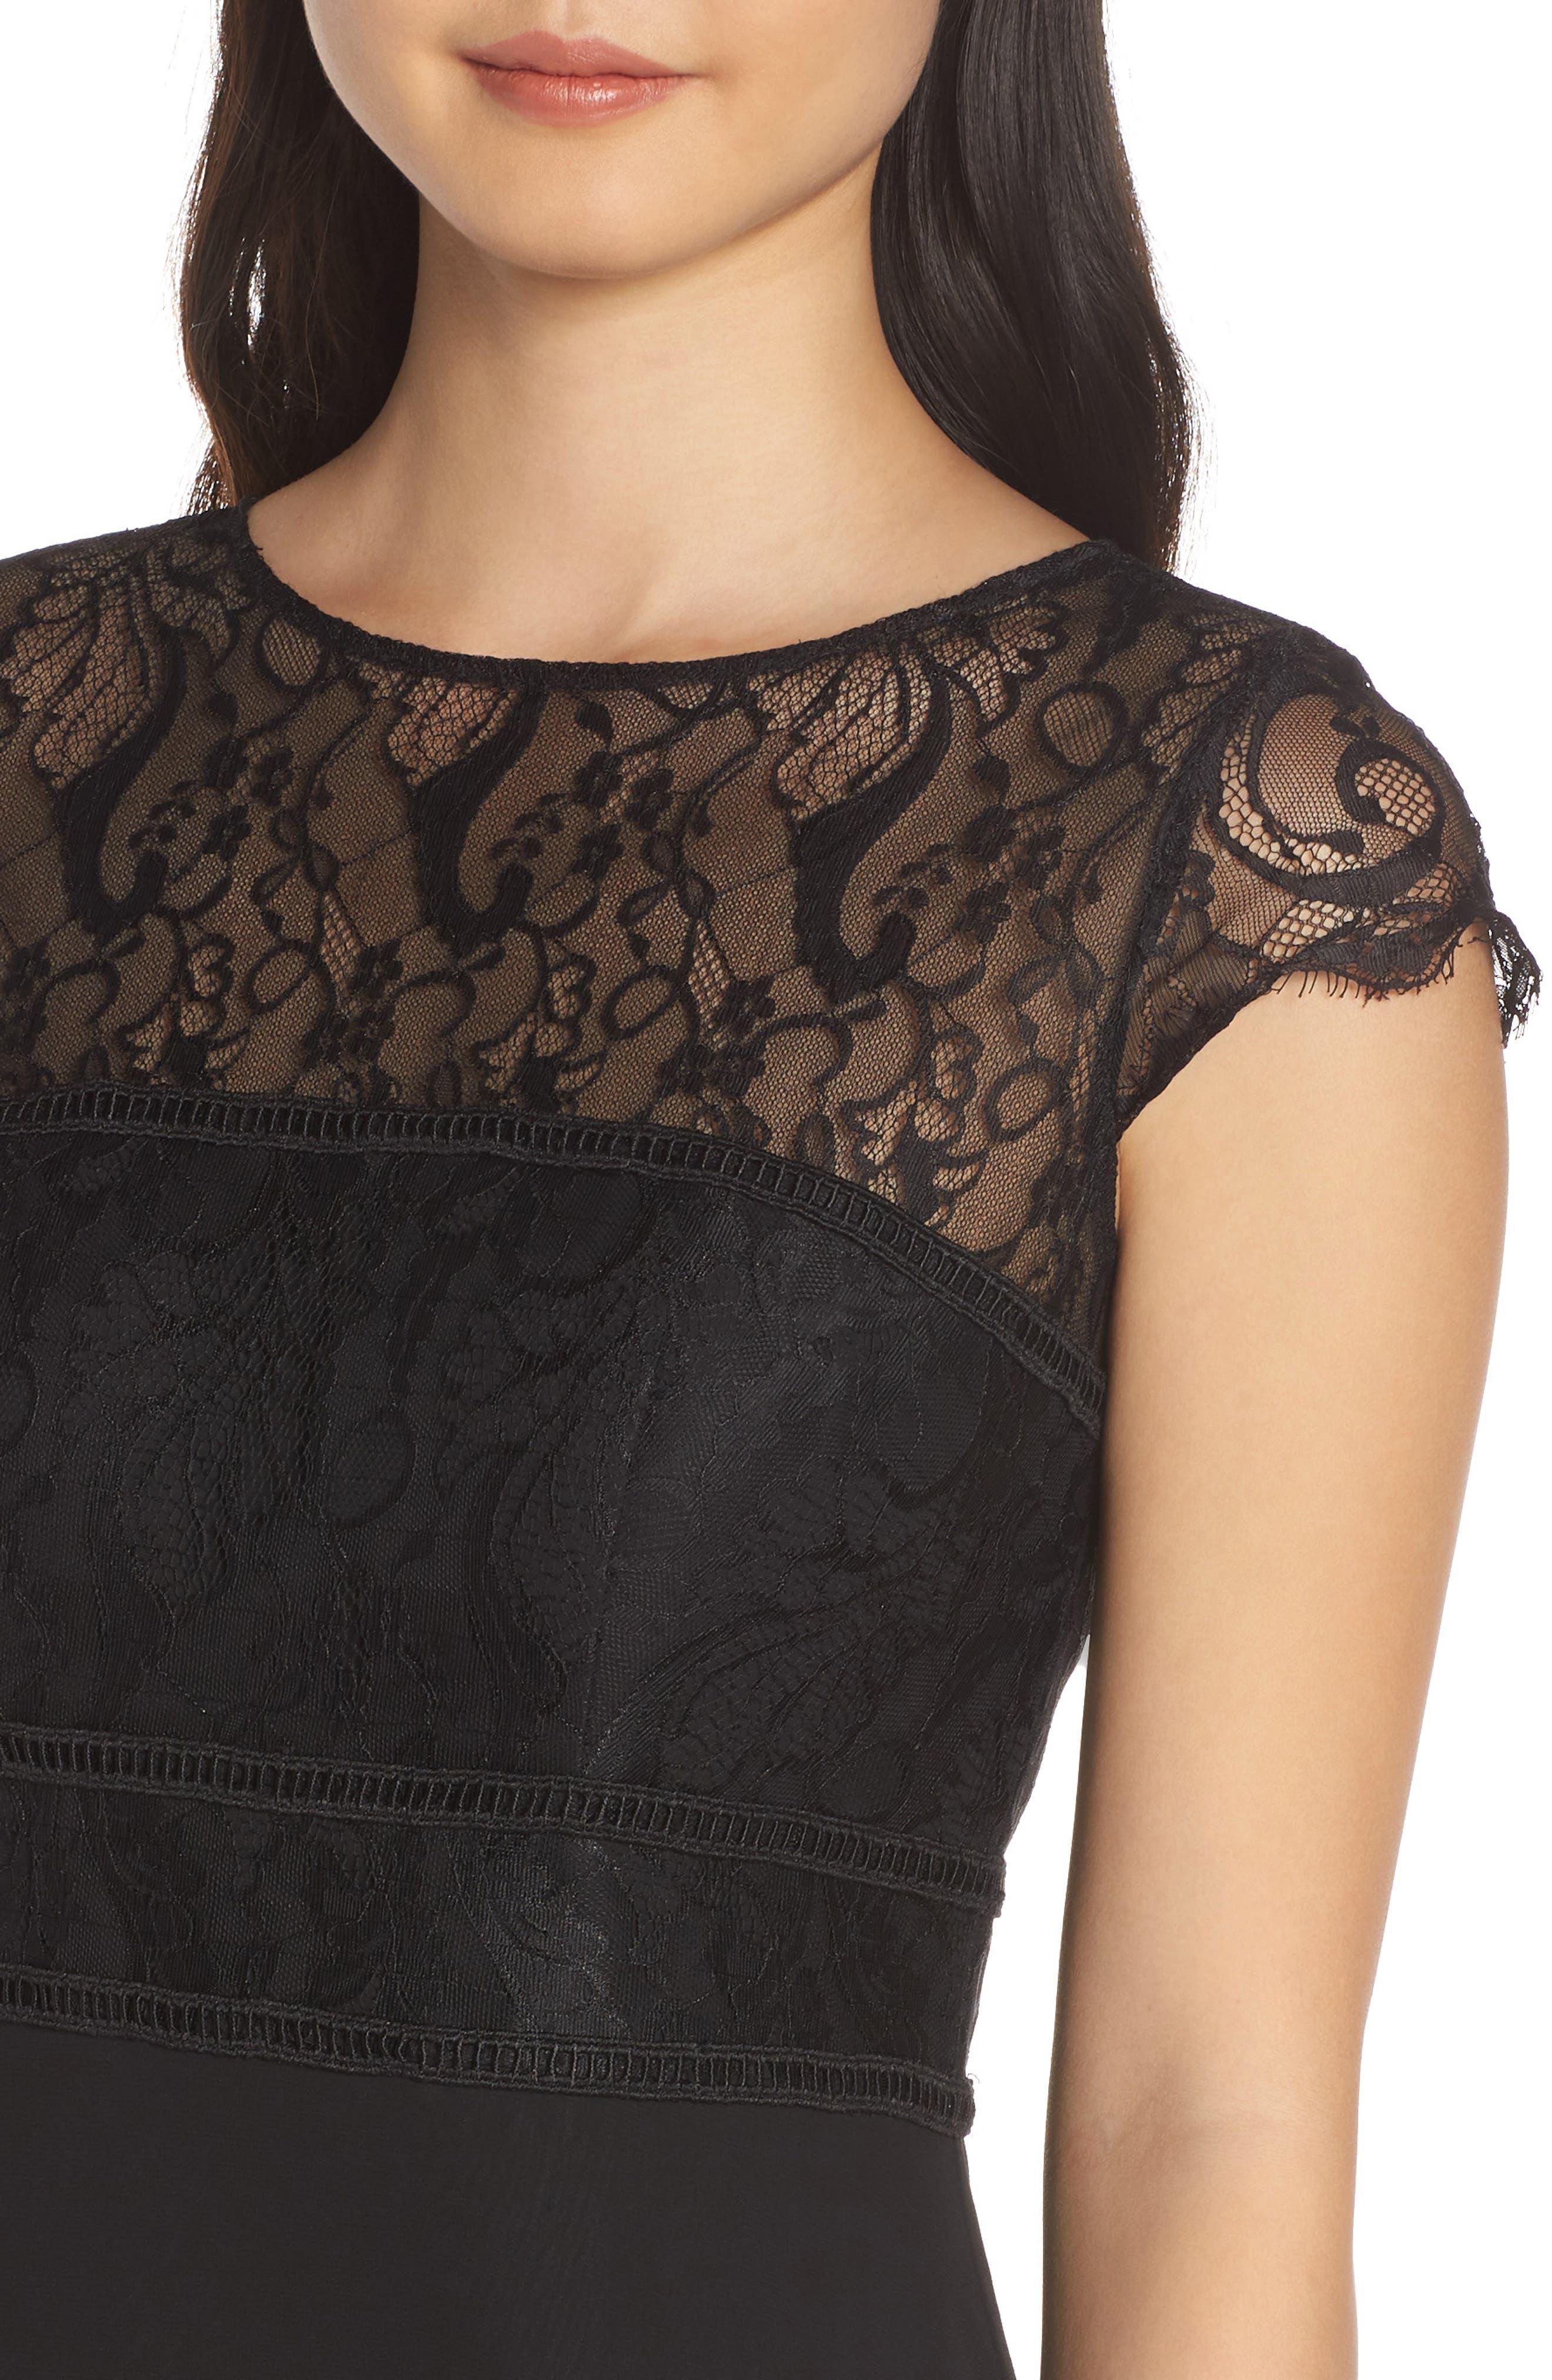 HAYLEY PAIGE OCCASIONS,                             Lace Bodice Chiffon Evening Dress,                             Alternate thumbnail 4, color,                             BLACK / BLACK